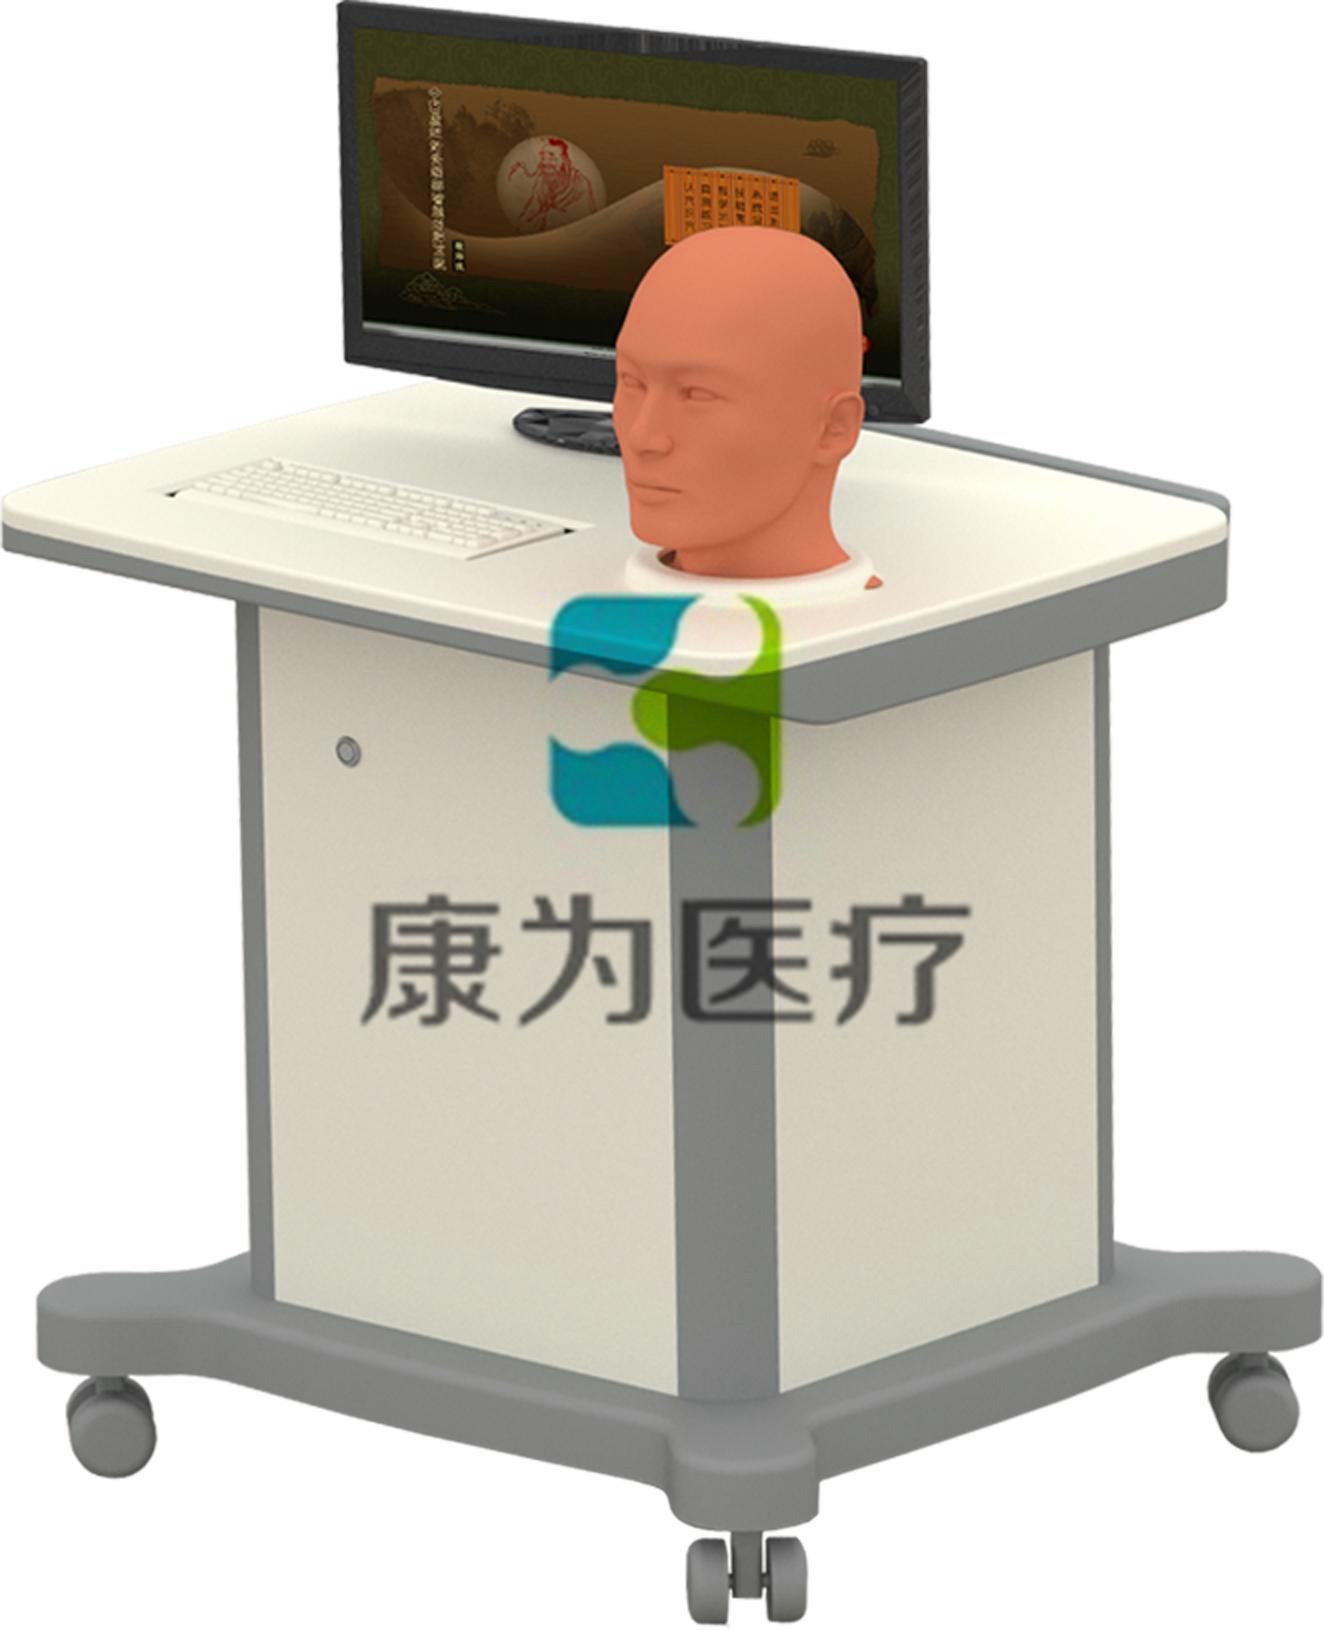 """betvlctor26伟德医疗""中医虚拟头部针灸智能考评系统"